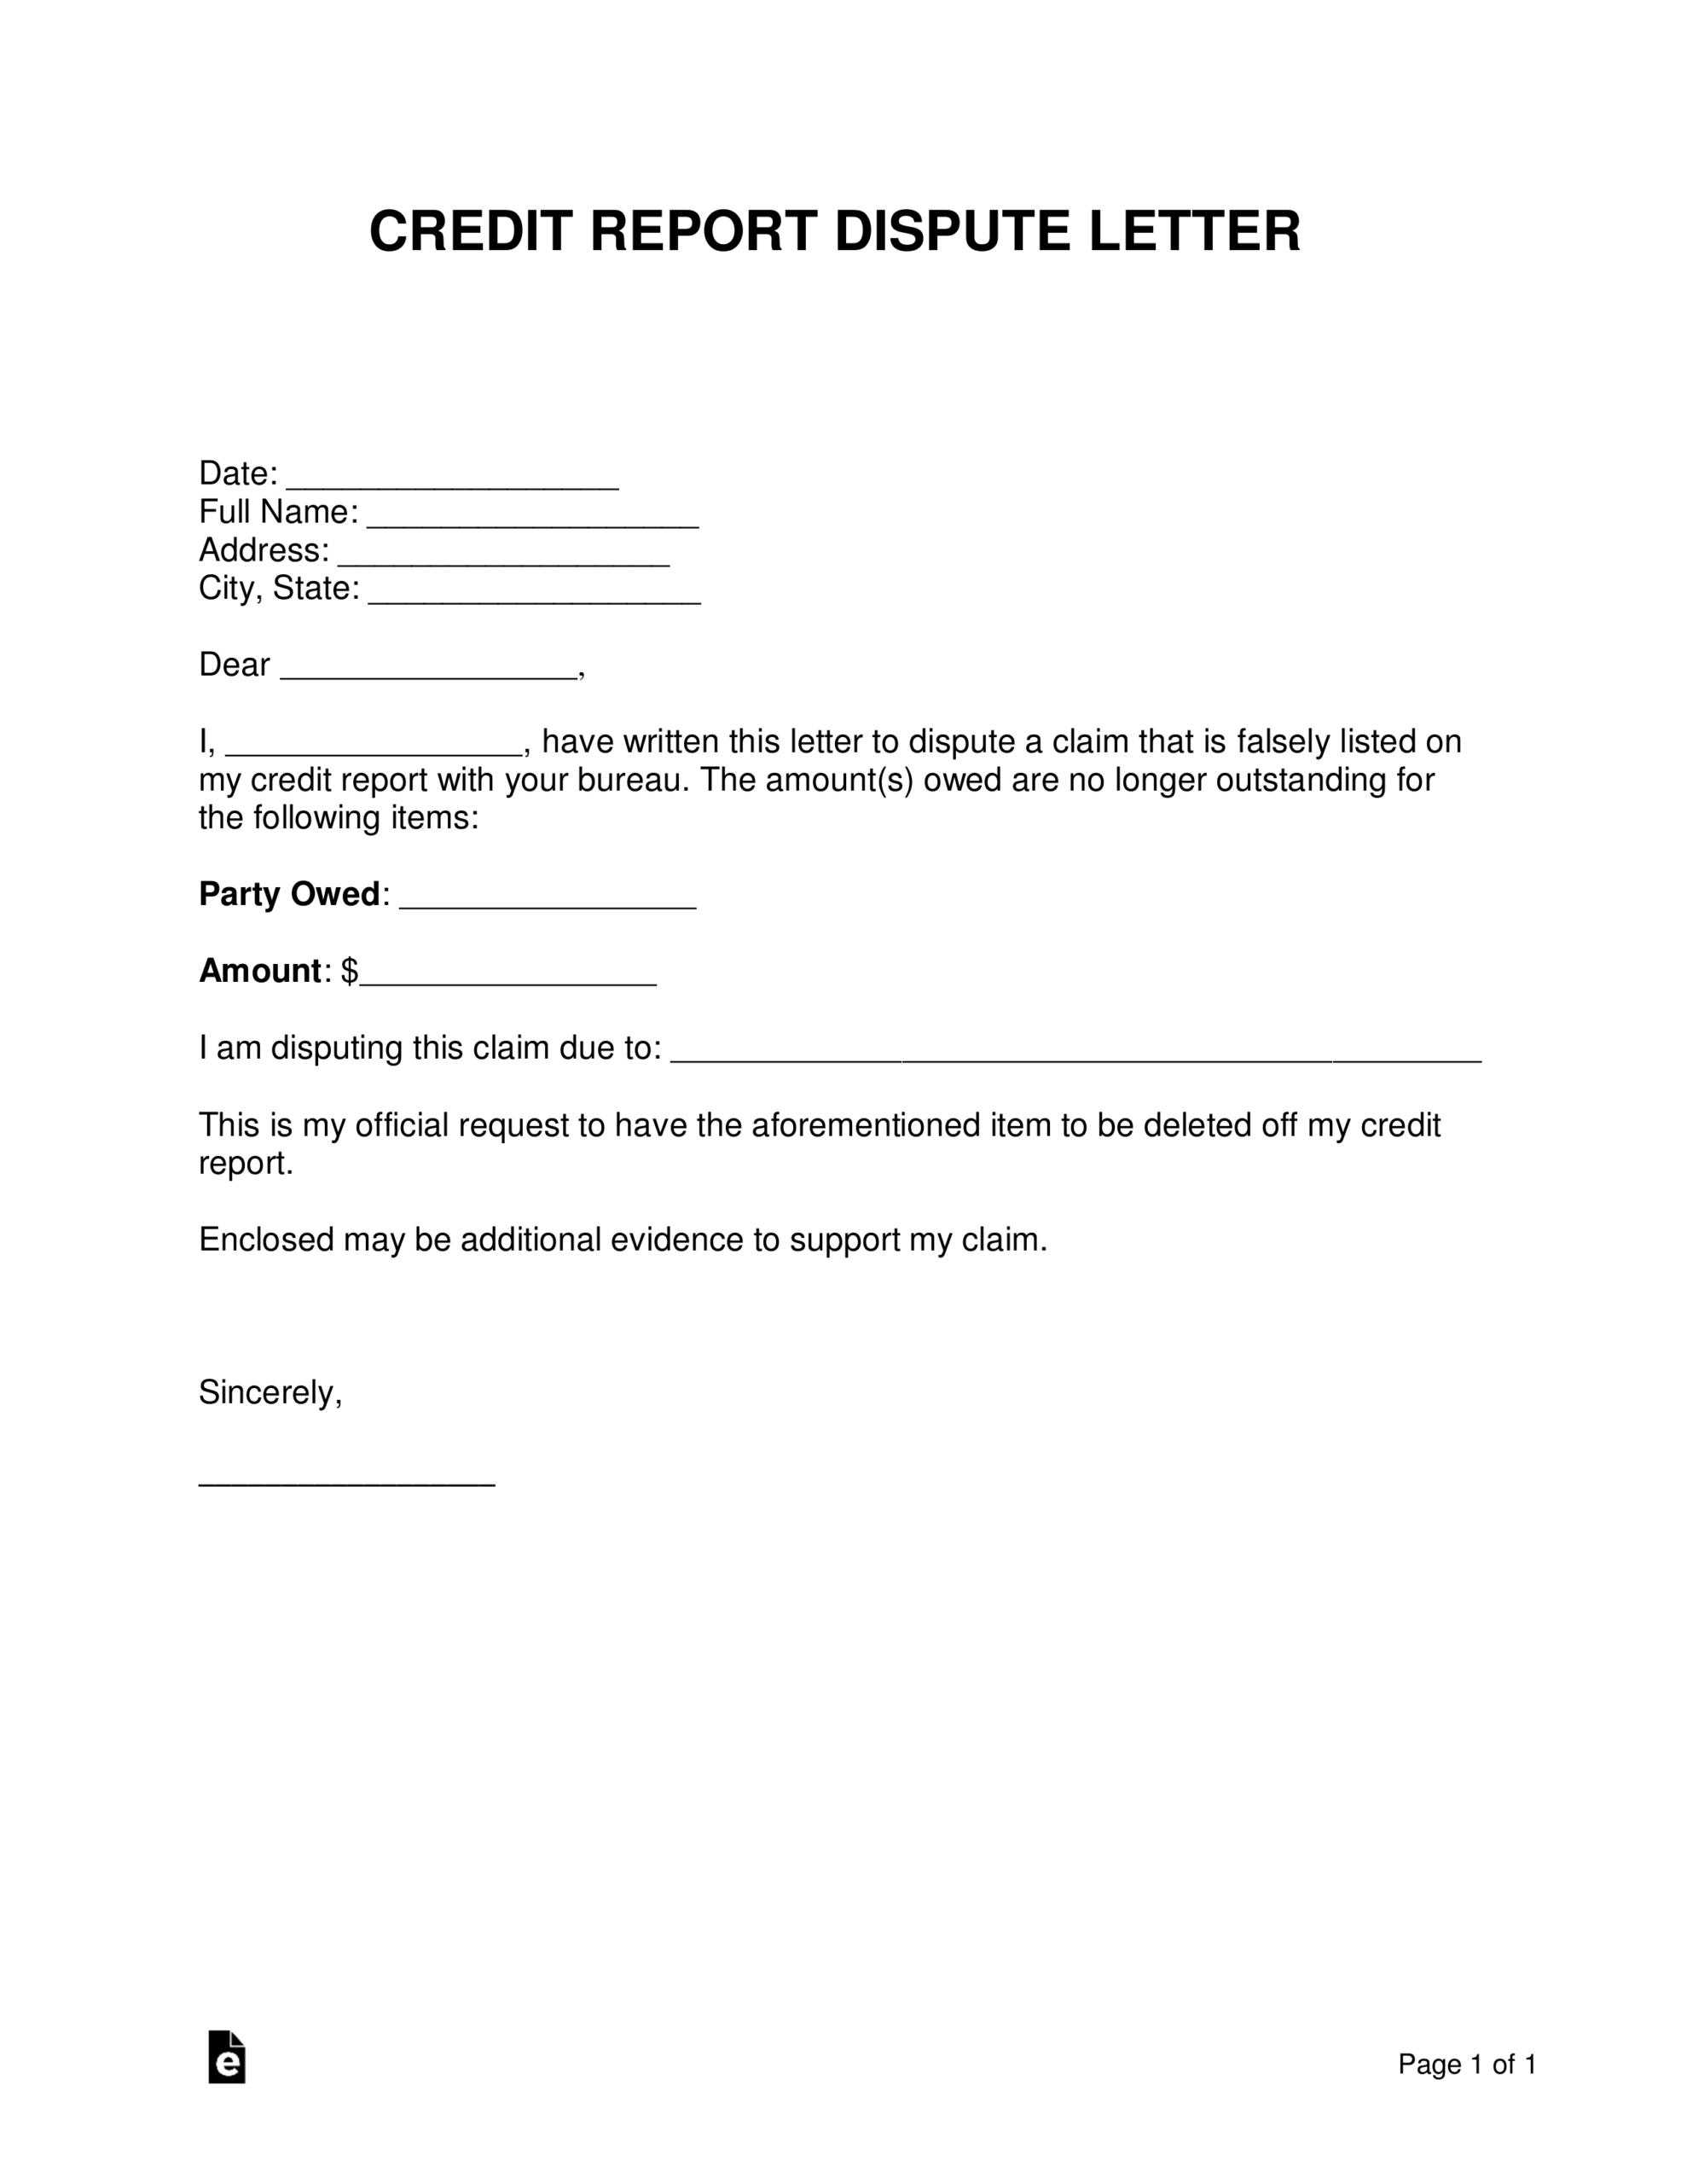 Free Credit Report Dispute Letter Template - Sample - Word Throughout Credit Report Dispute Letter Template